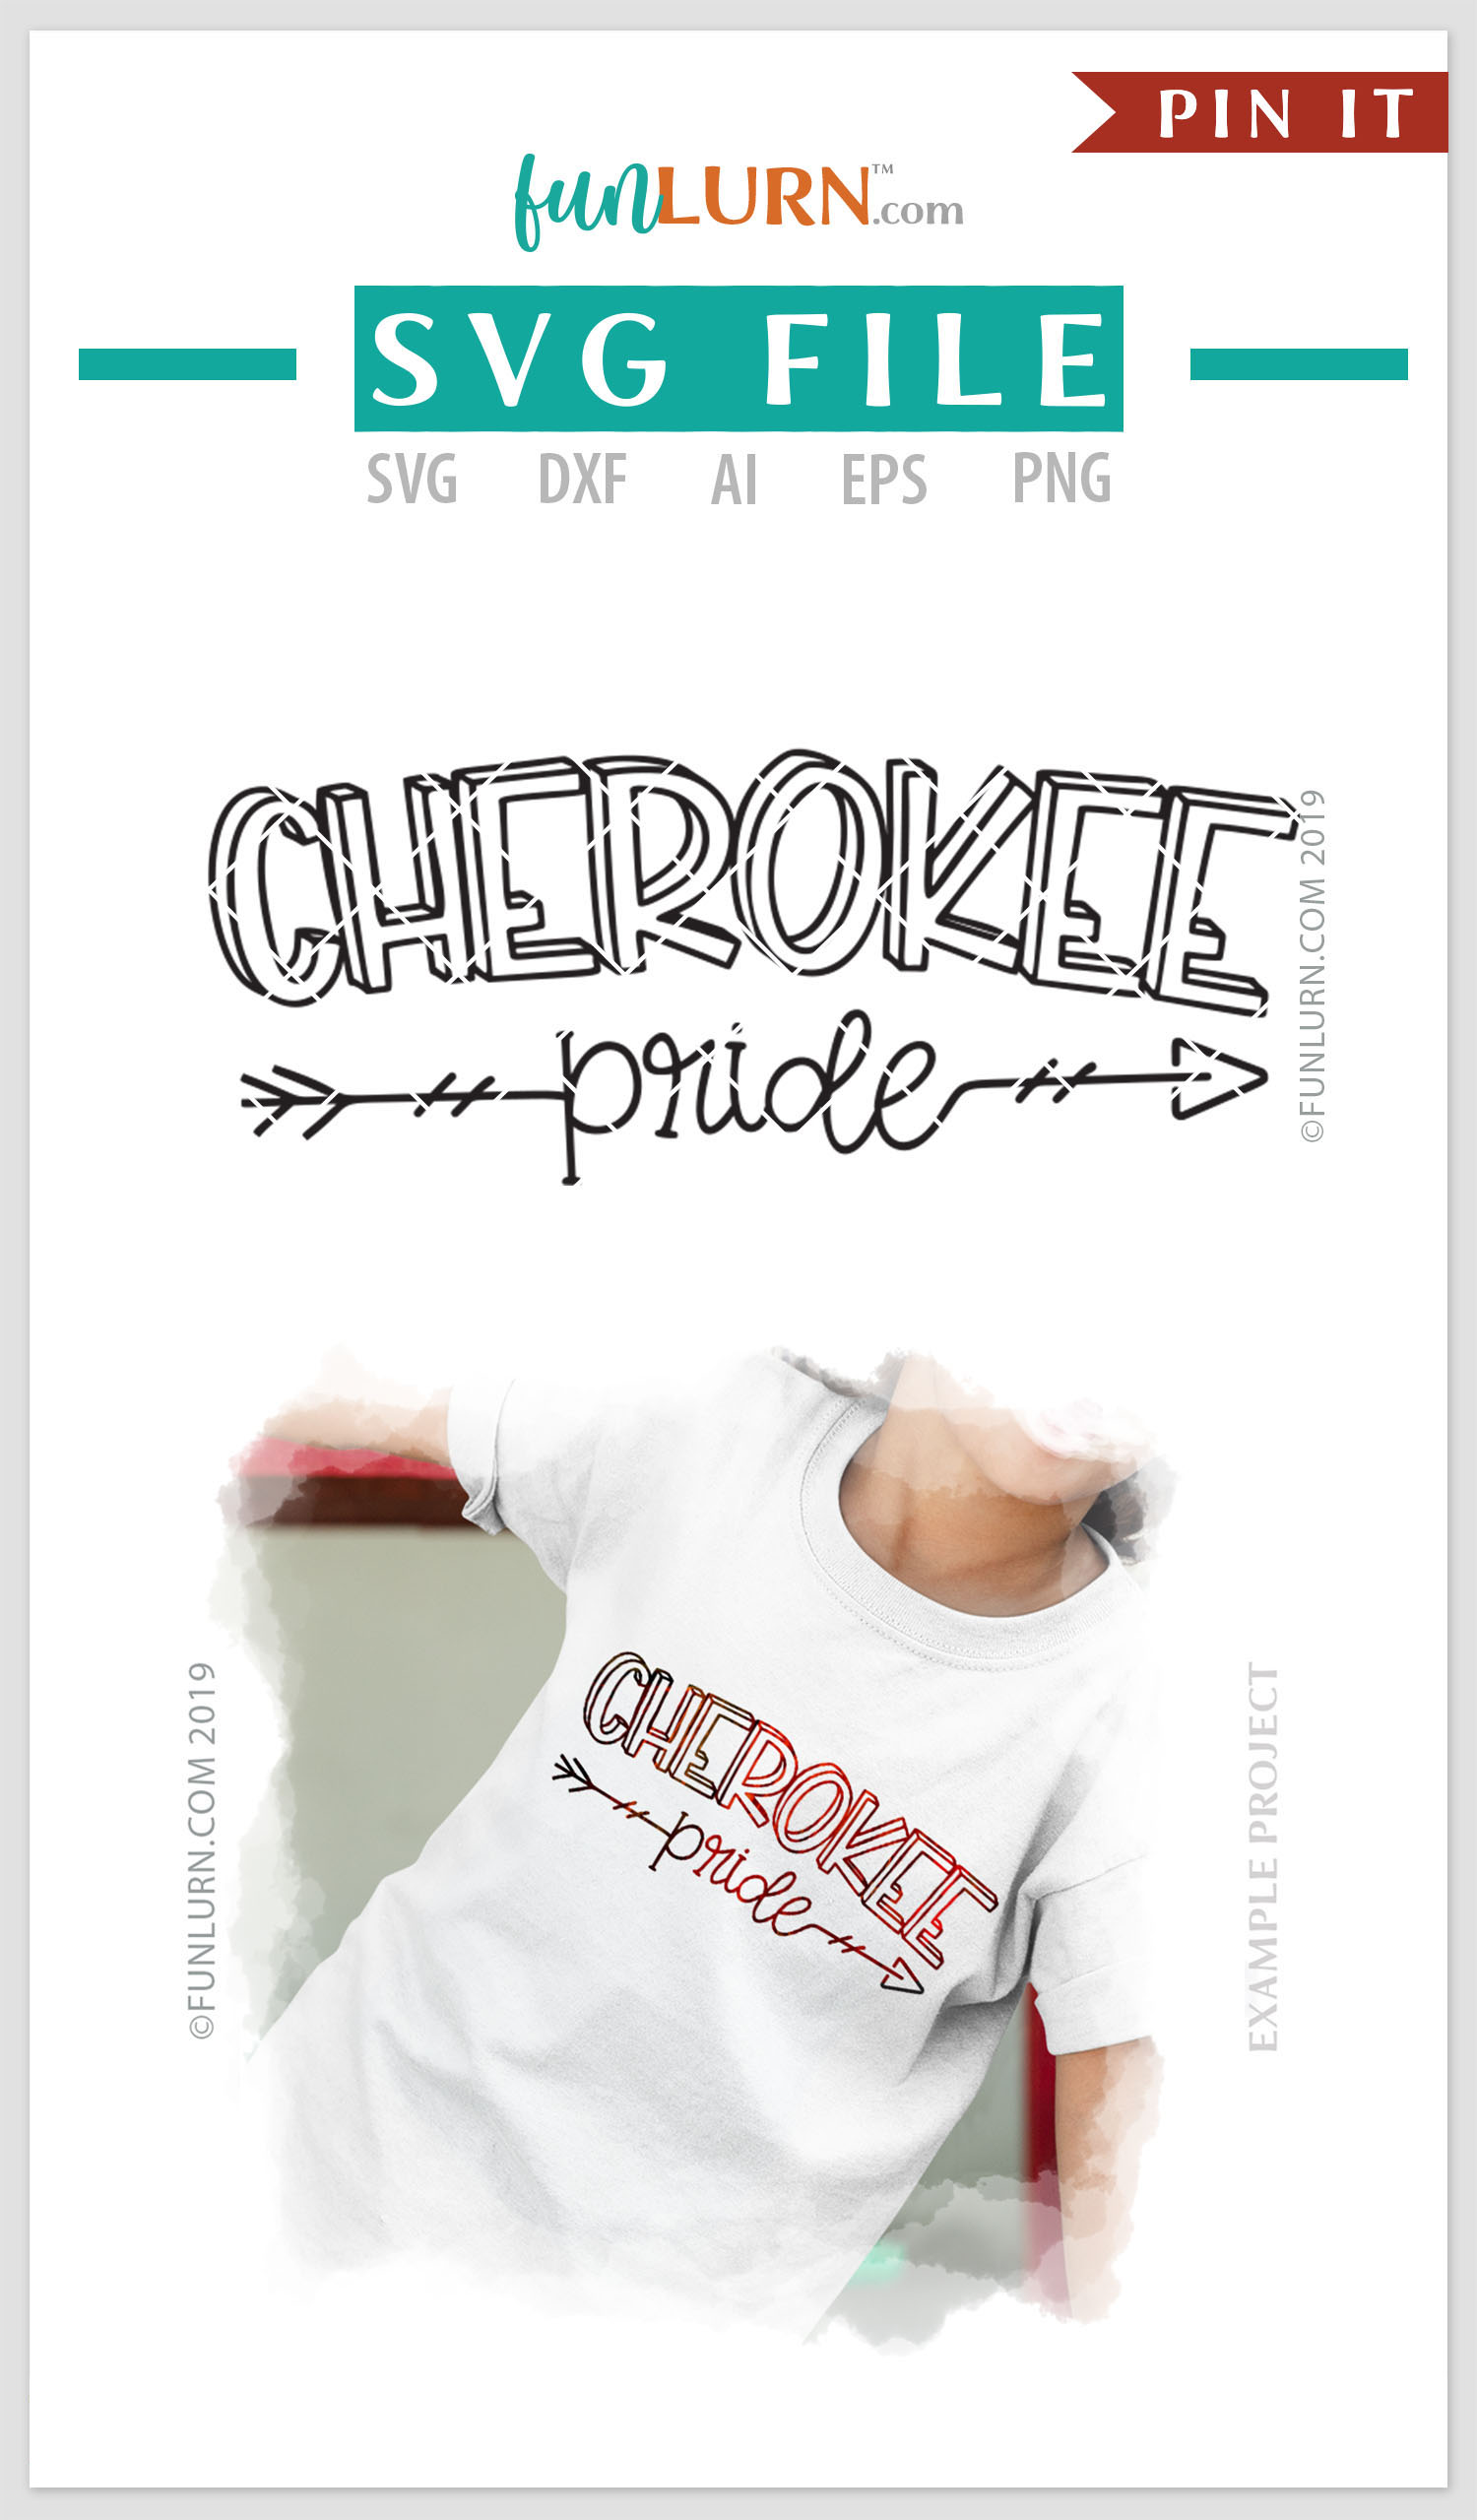 Cherokee Pride Team SVG Cut File example image 4